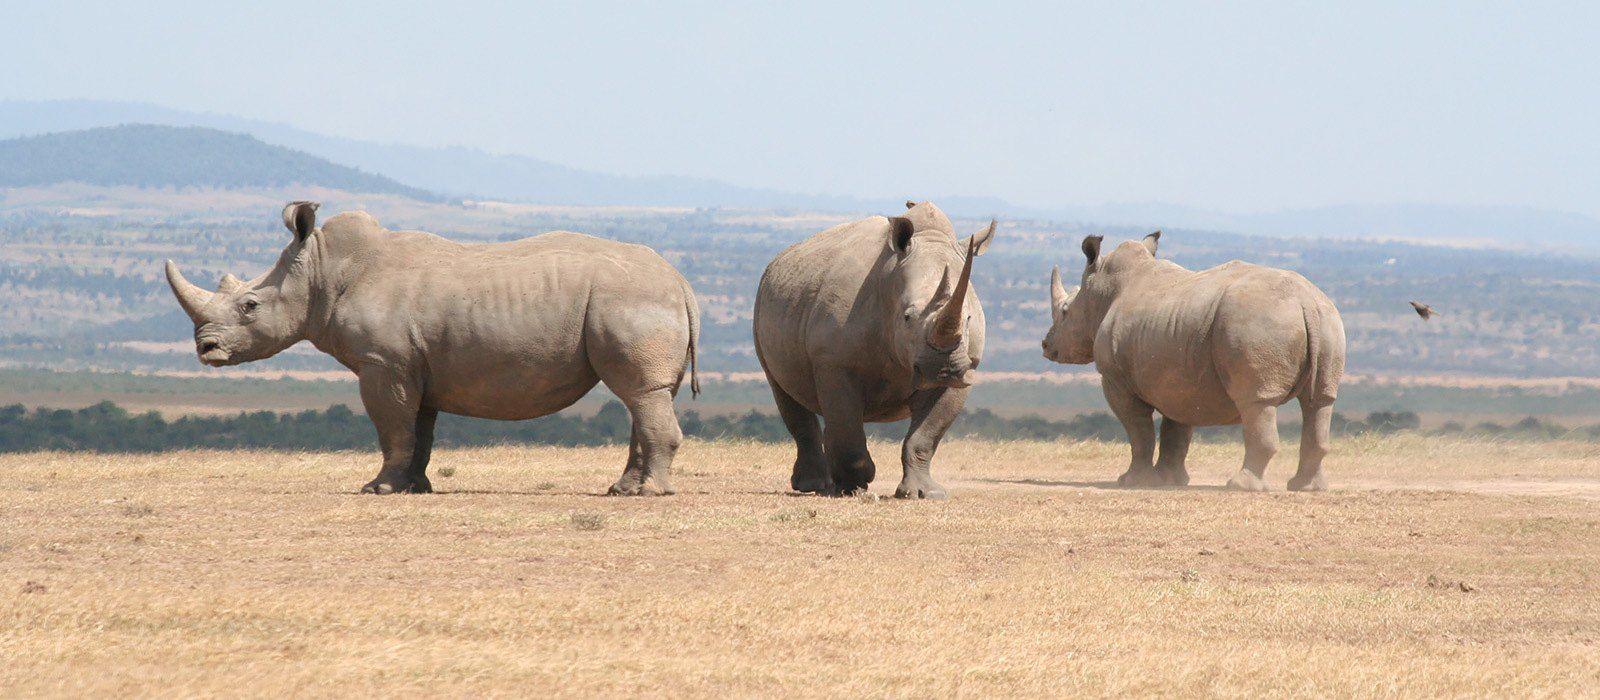 Kenia und Tansania: Kamel Trekking und Strandurlaub Urlaub 2